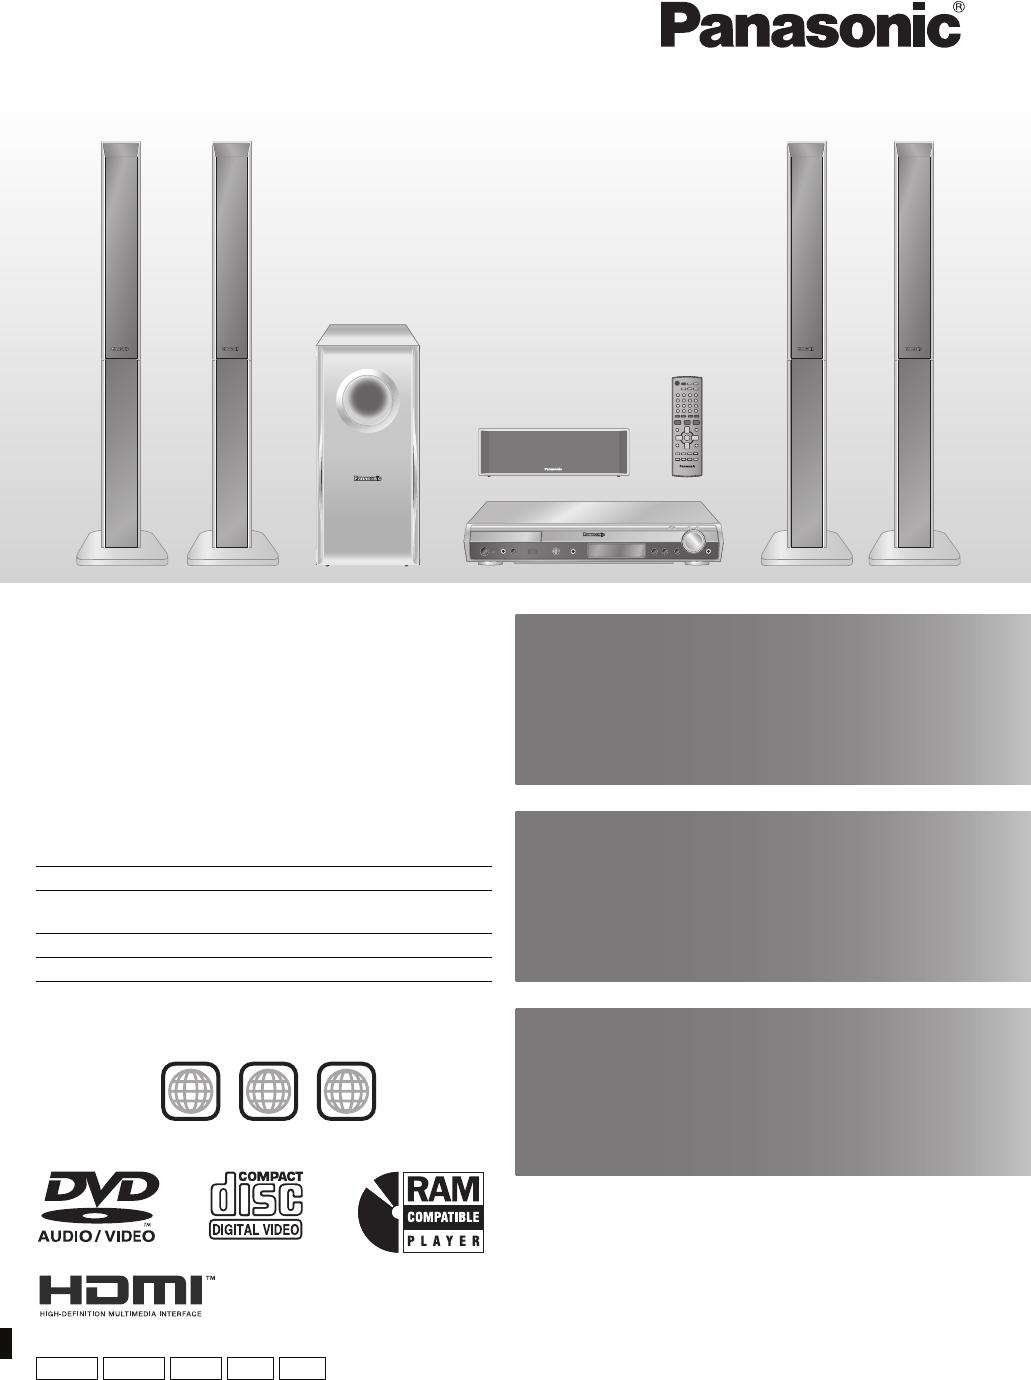 Panasonic SC HT895 En User Manual To The 7f5c606f 8534 4568